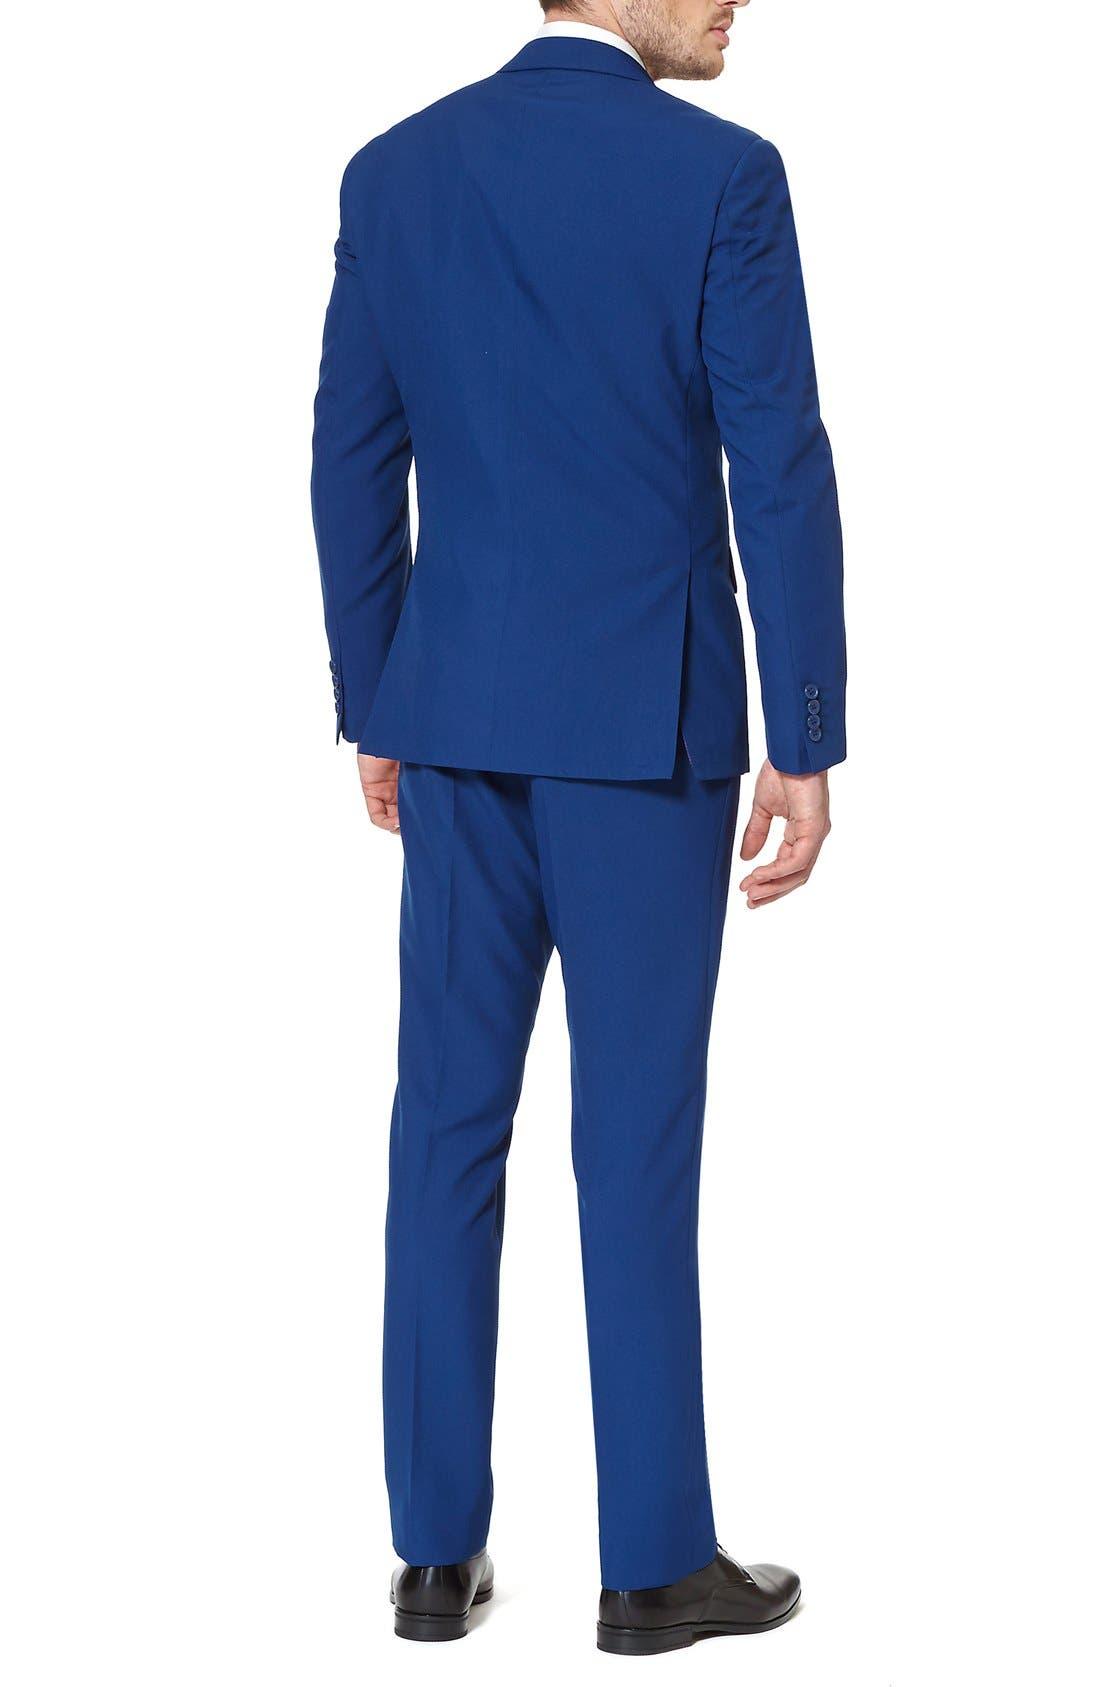 'Navy Royale' Trim Fit Two-Piece Suit with Tie,                             Alternate thumbnail 3, color,                             410